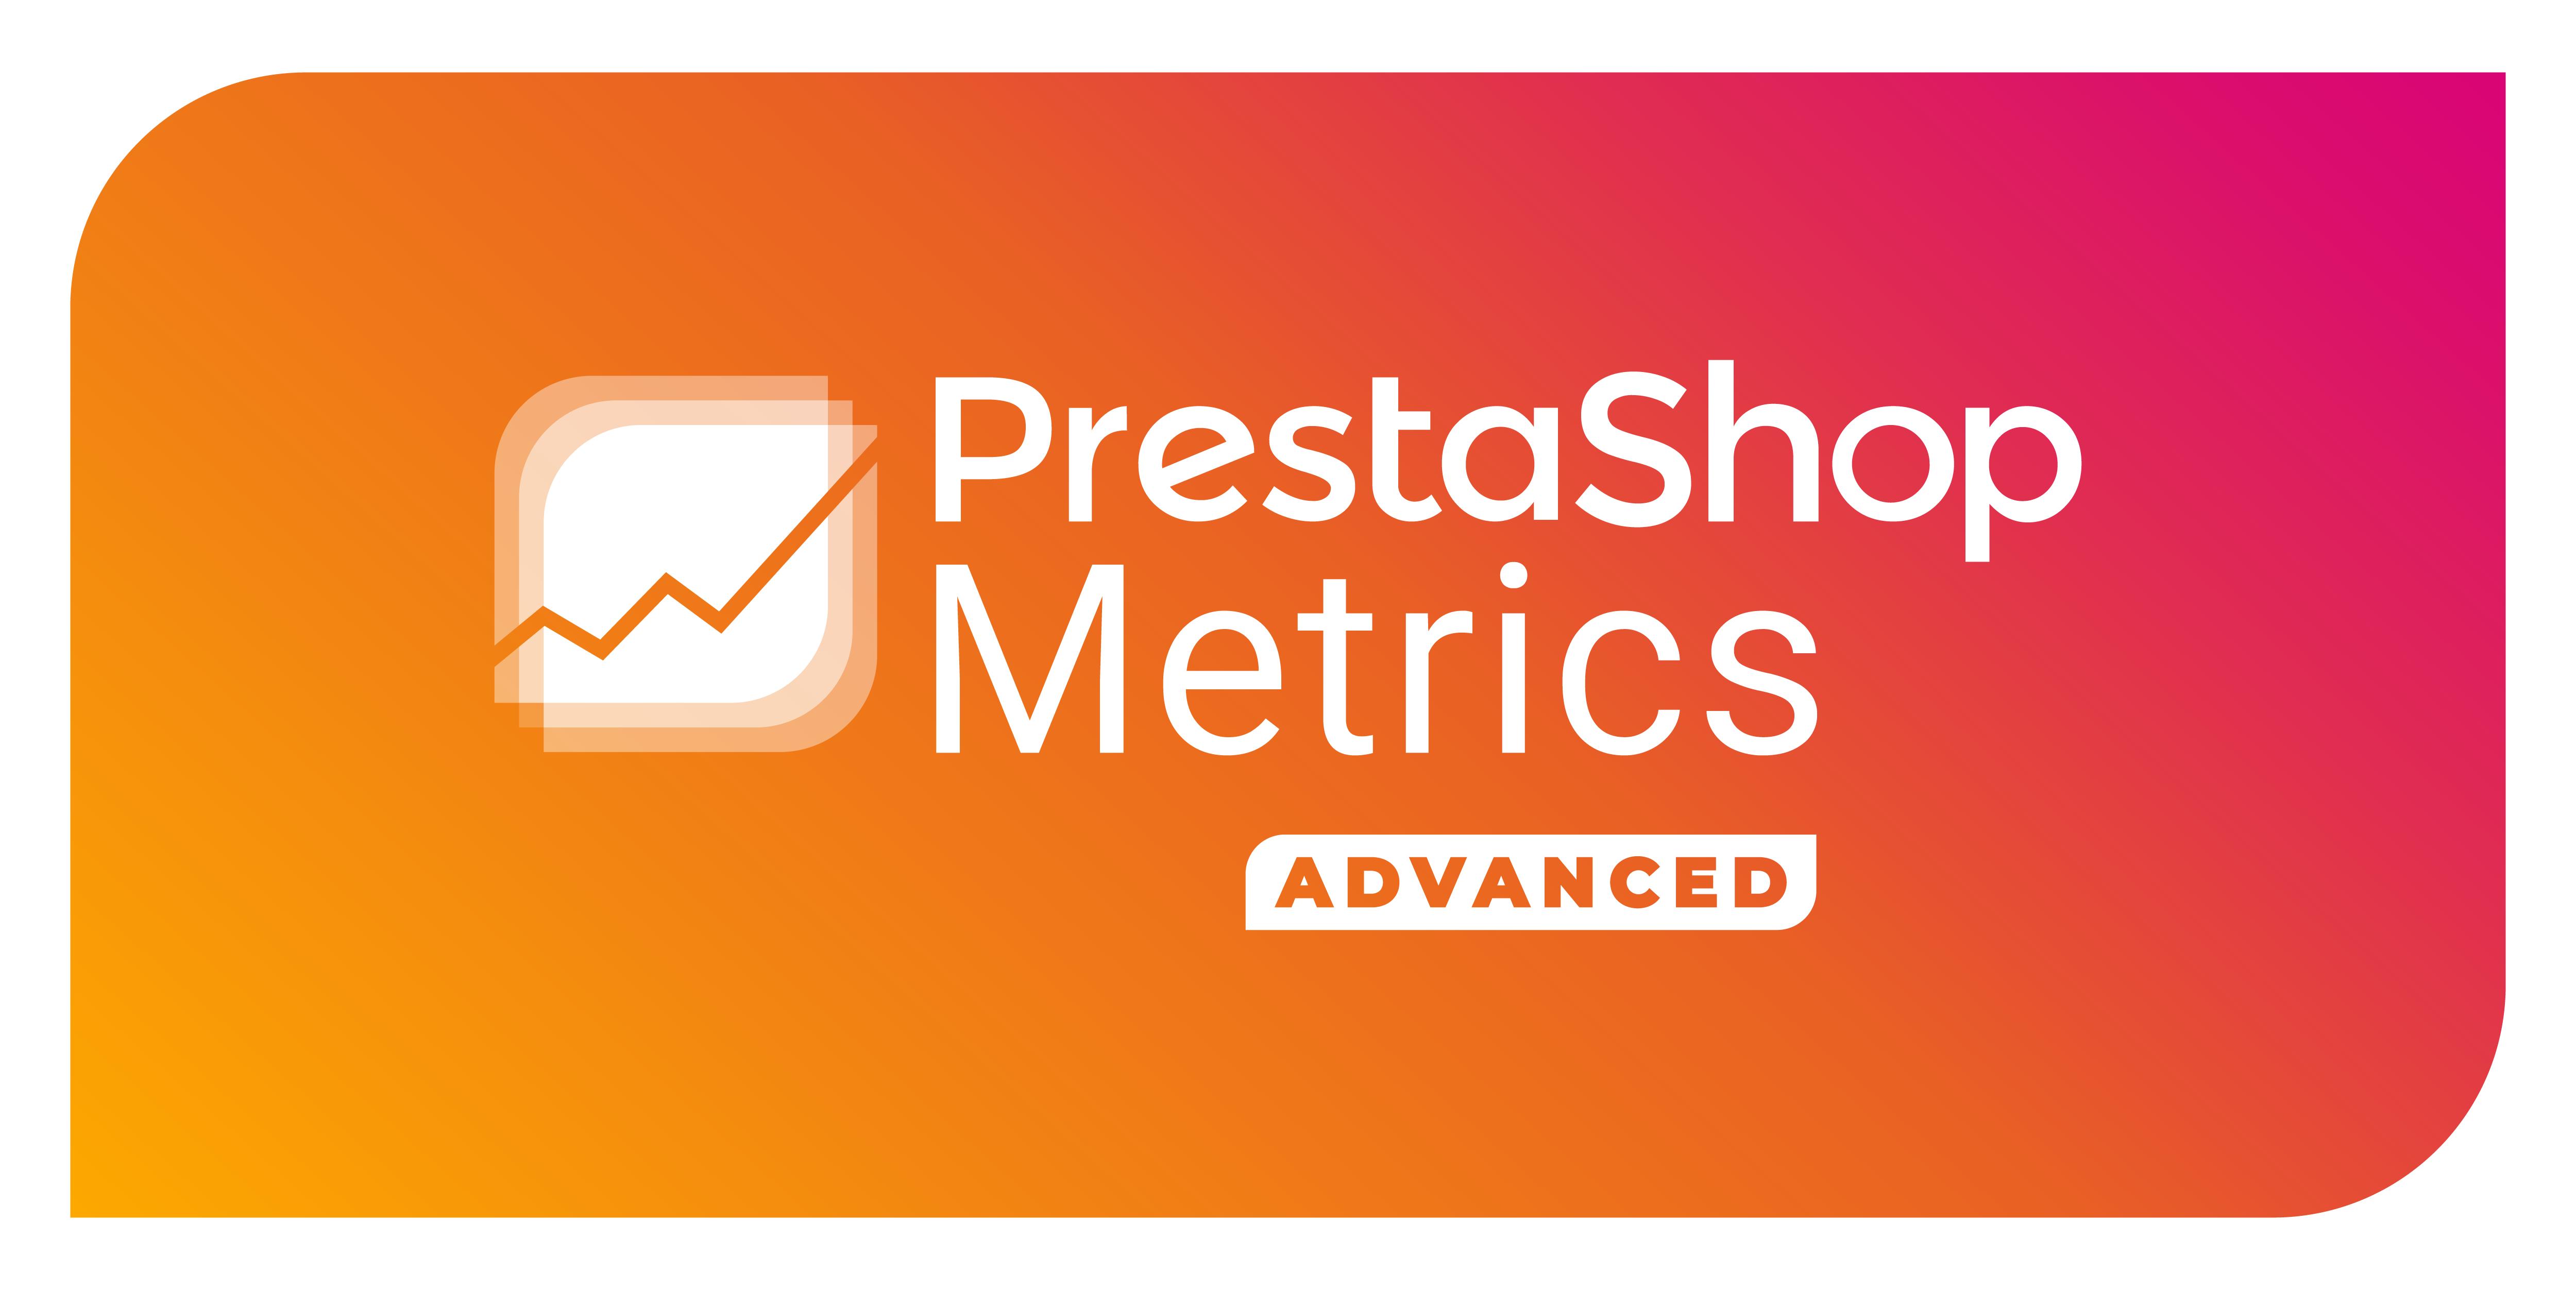 PrestaShop Metrics Advanced